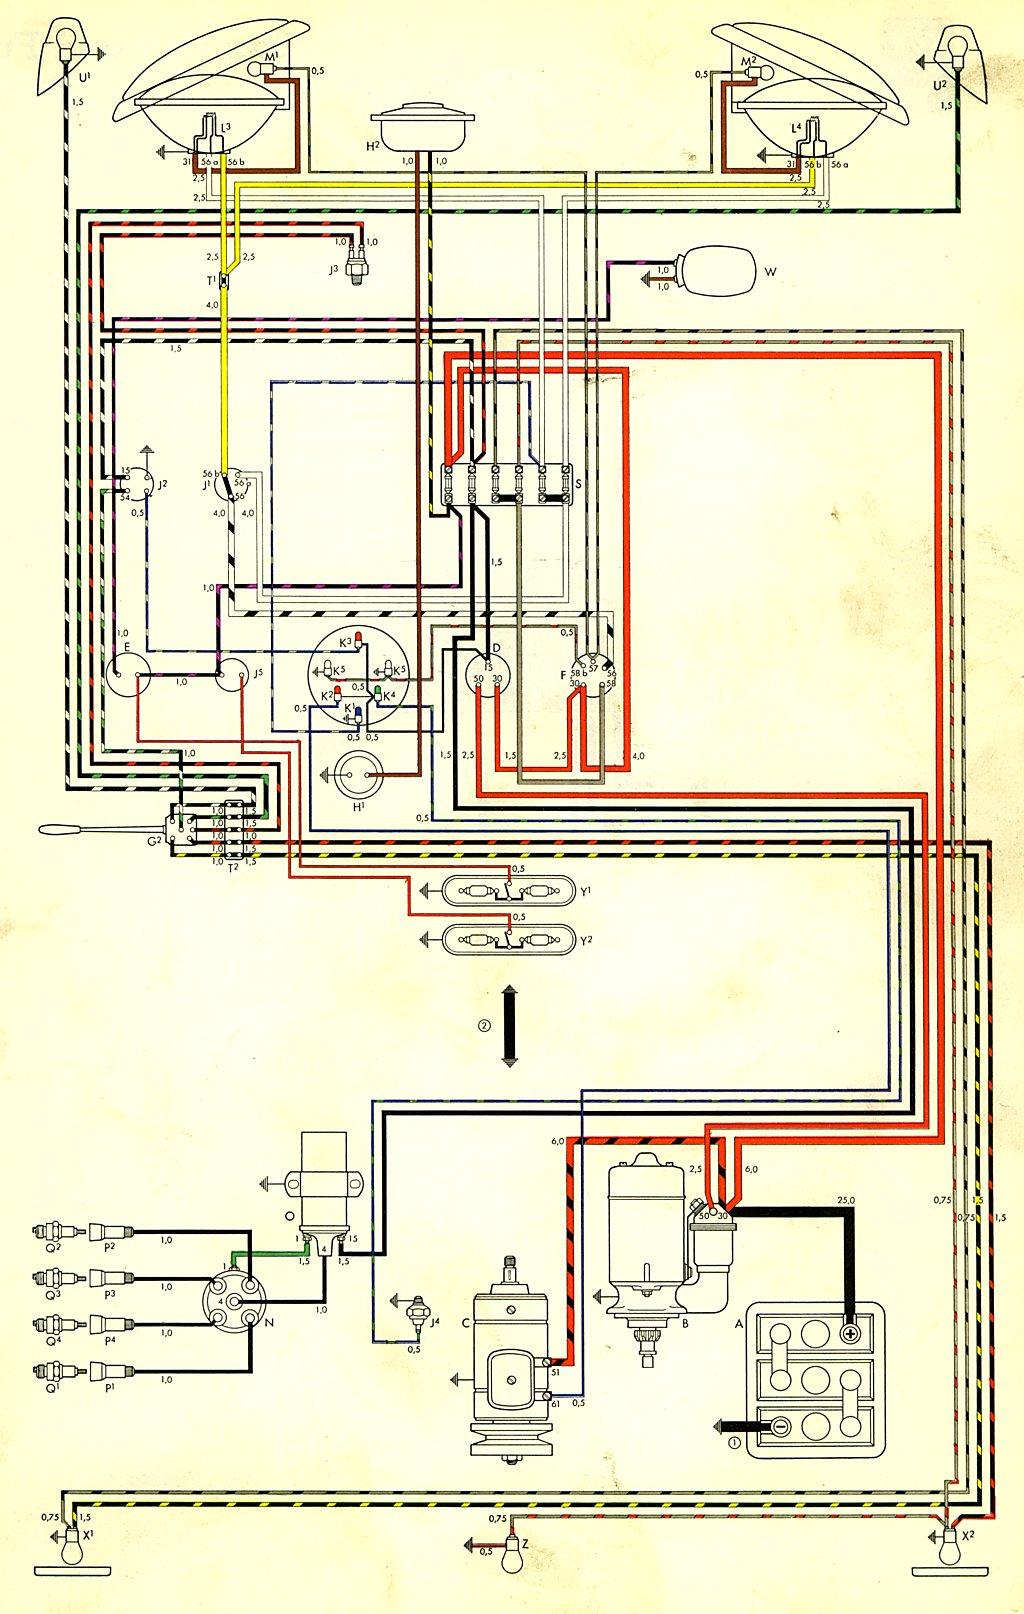 83 Mustang Engine Wiring Harness 1959 Bus Wiring Diagram Usa Thegoldenbug Com